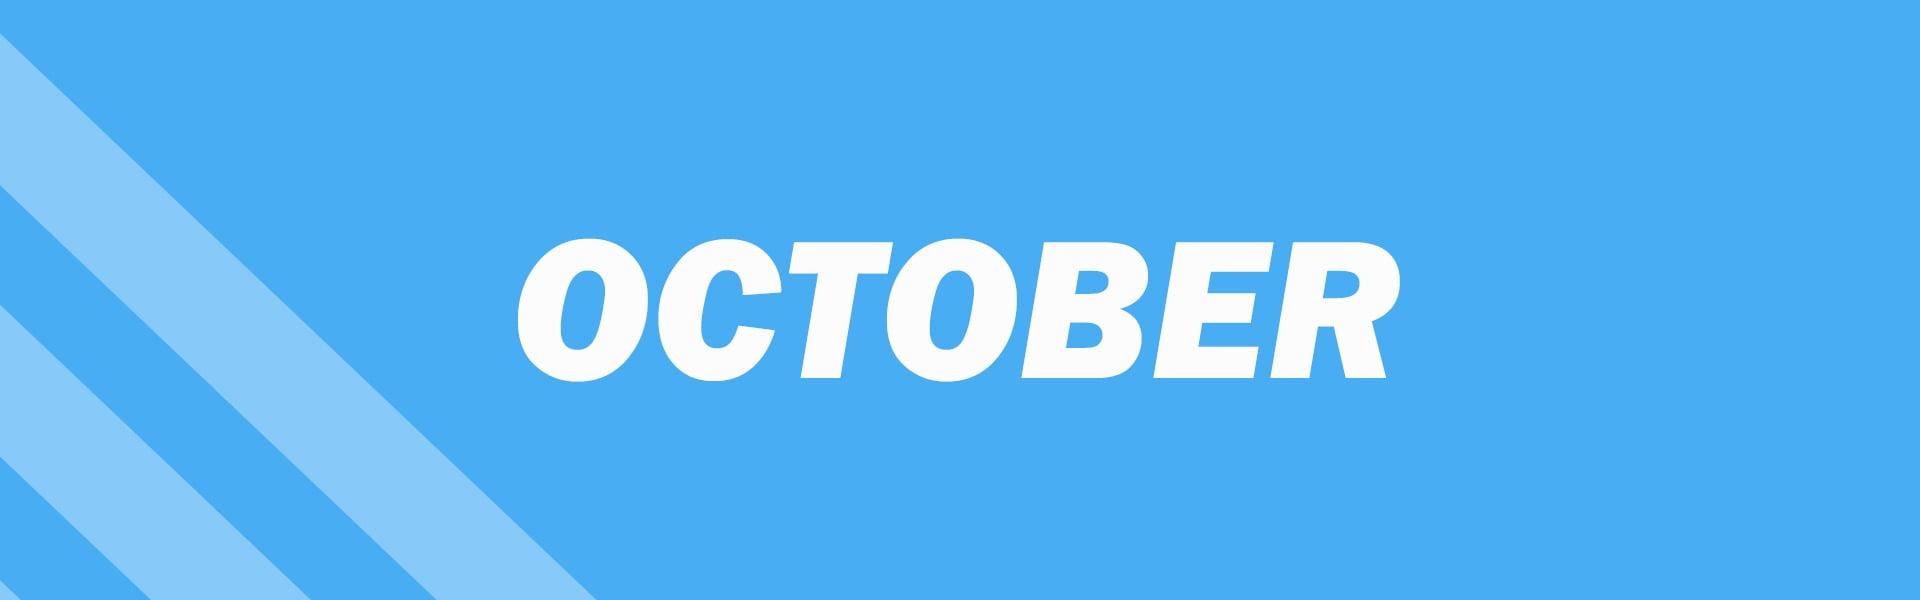 october_declaration-banner